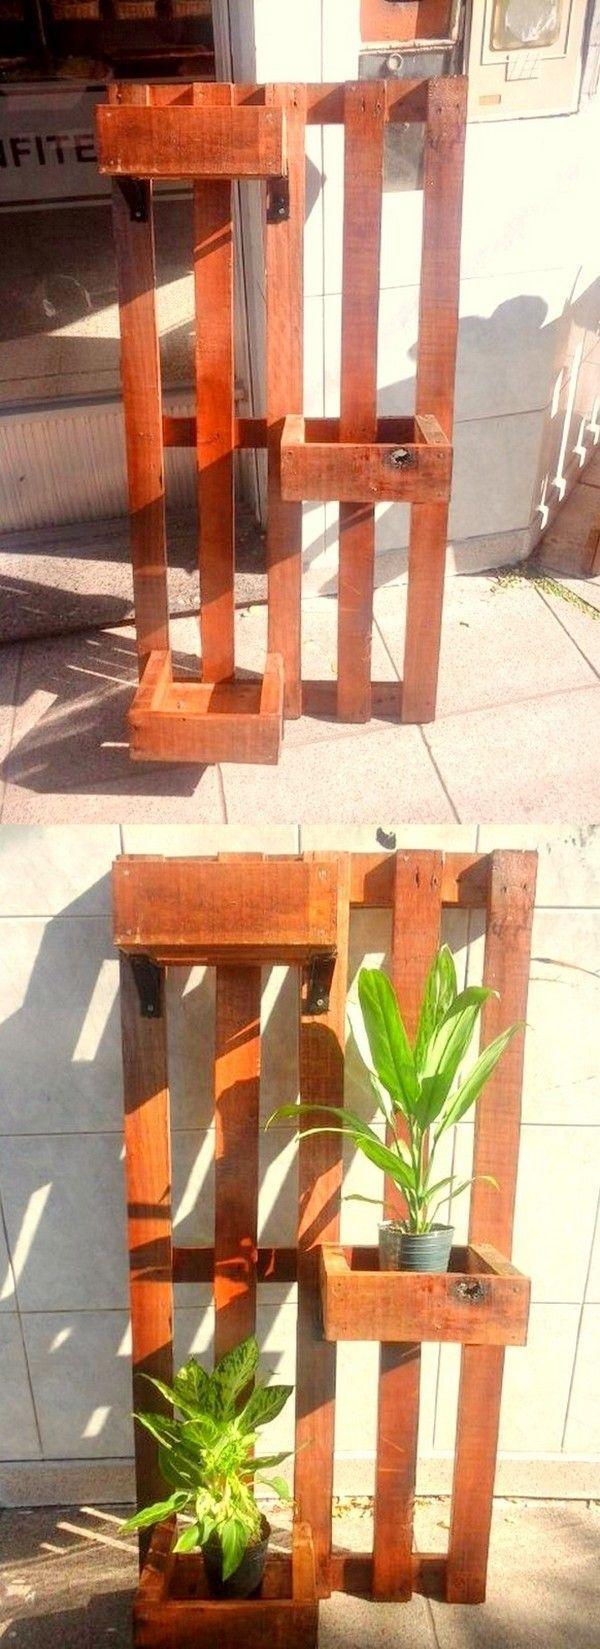 Skid Pallet Furniture Designs Furnituredesign Furniture Design In